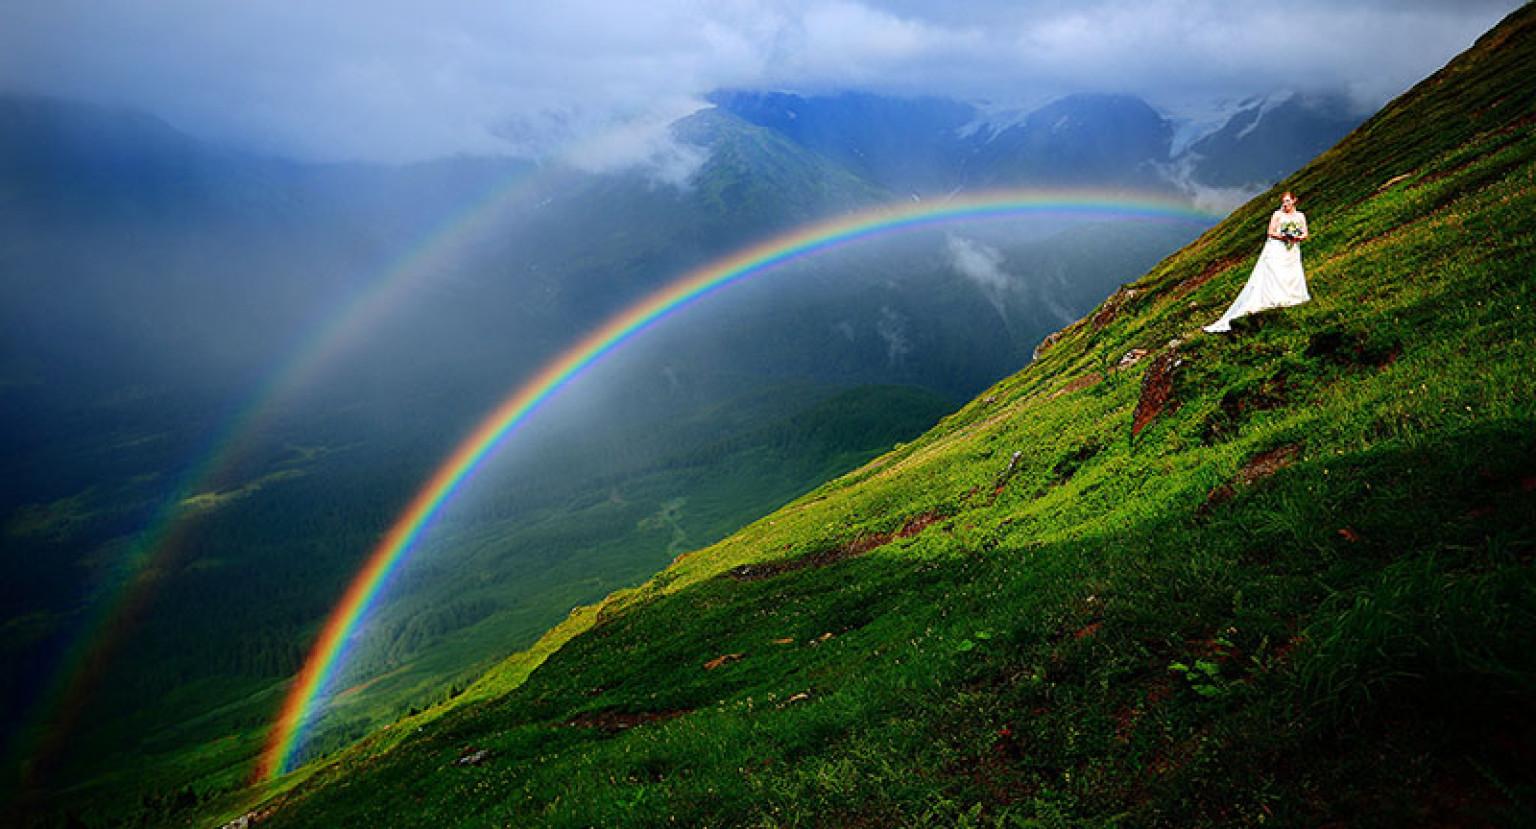 http://i.huffpost.com/gen/1294910/thumbs/o-DOUBLE-RAINBOW-facebook.jpg